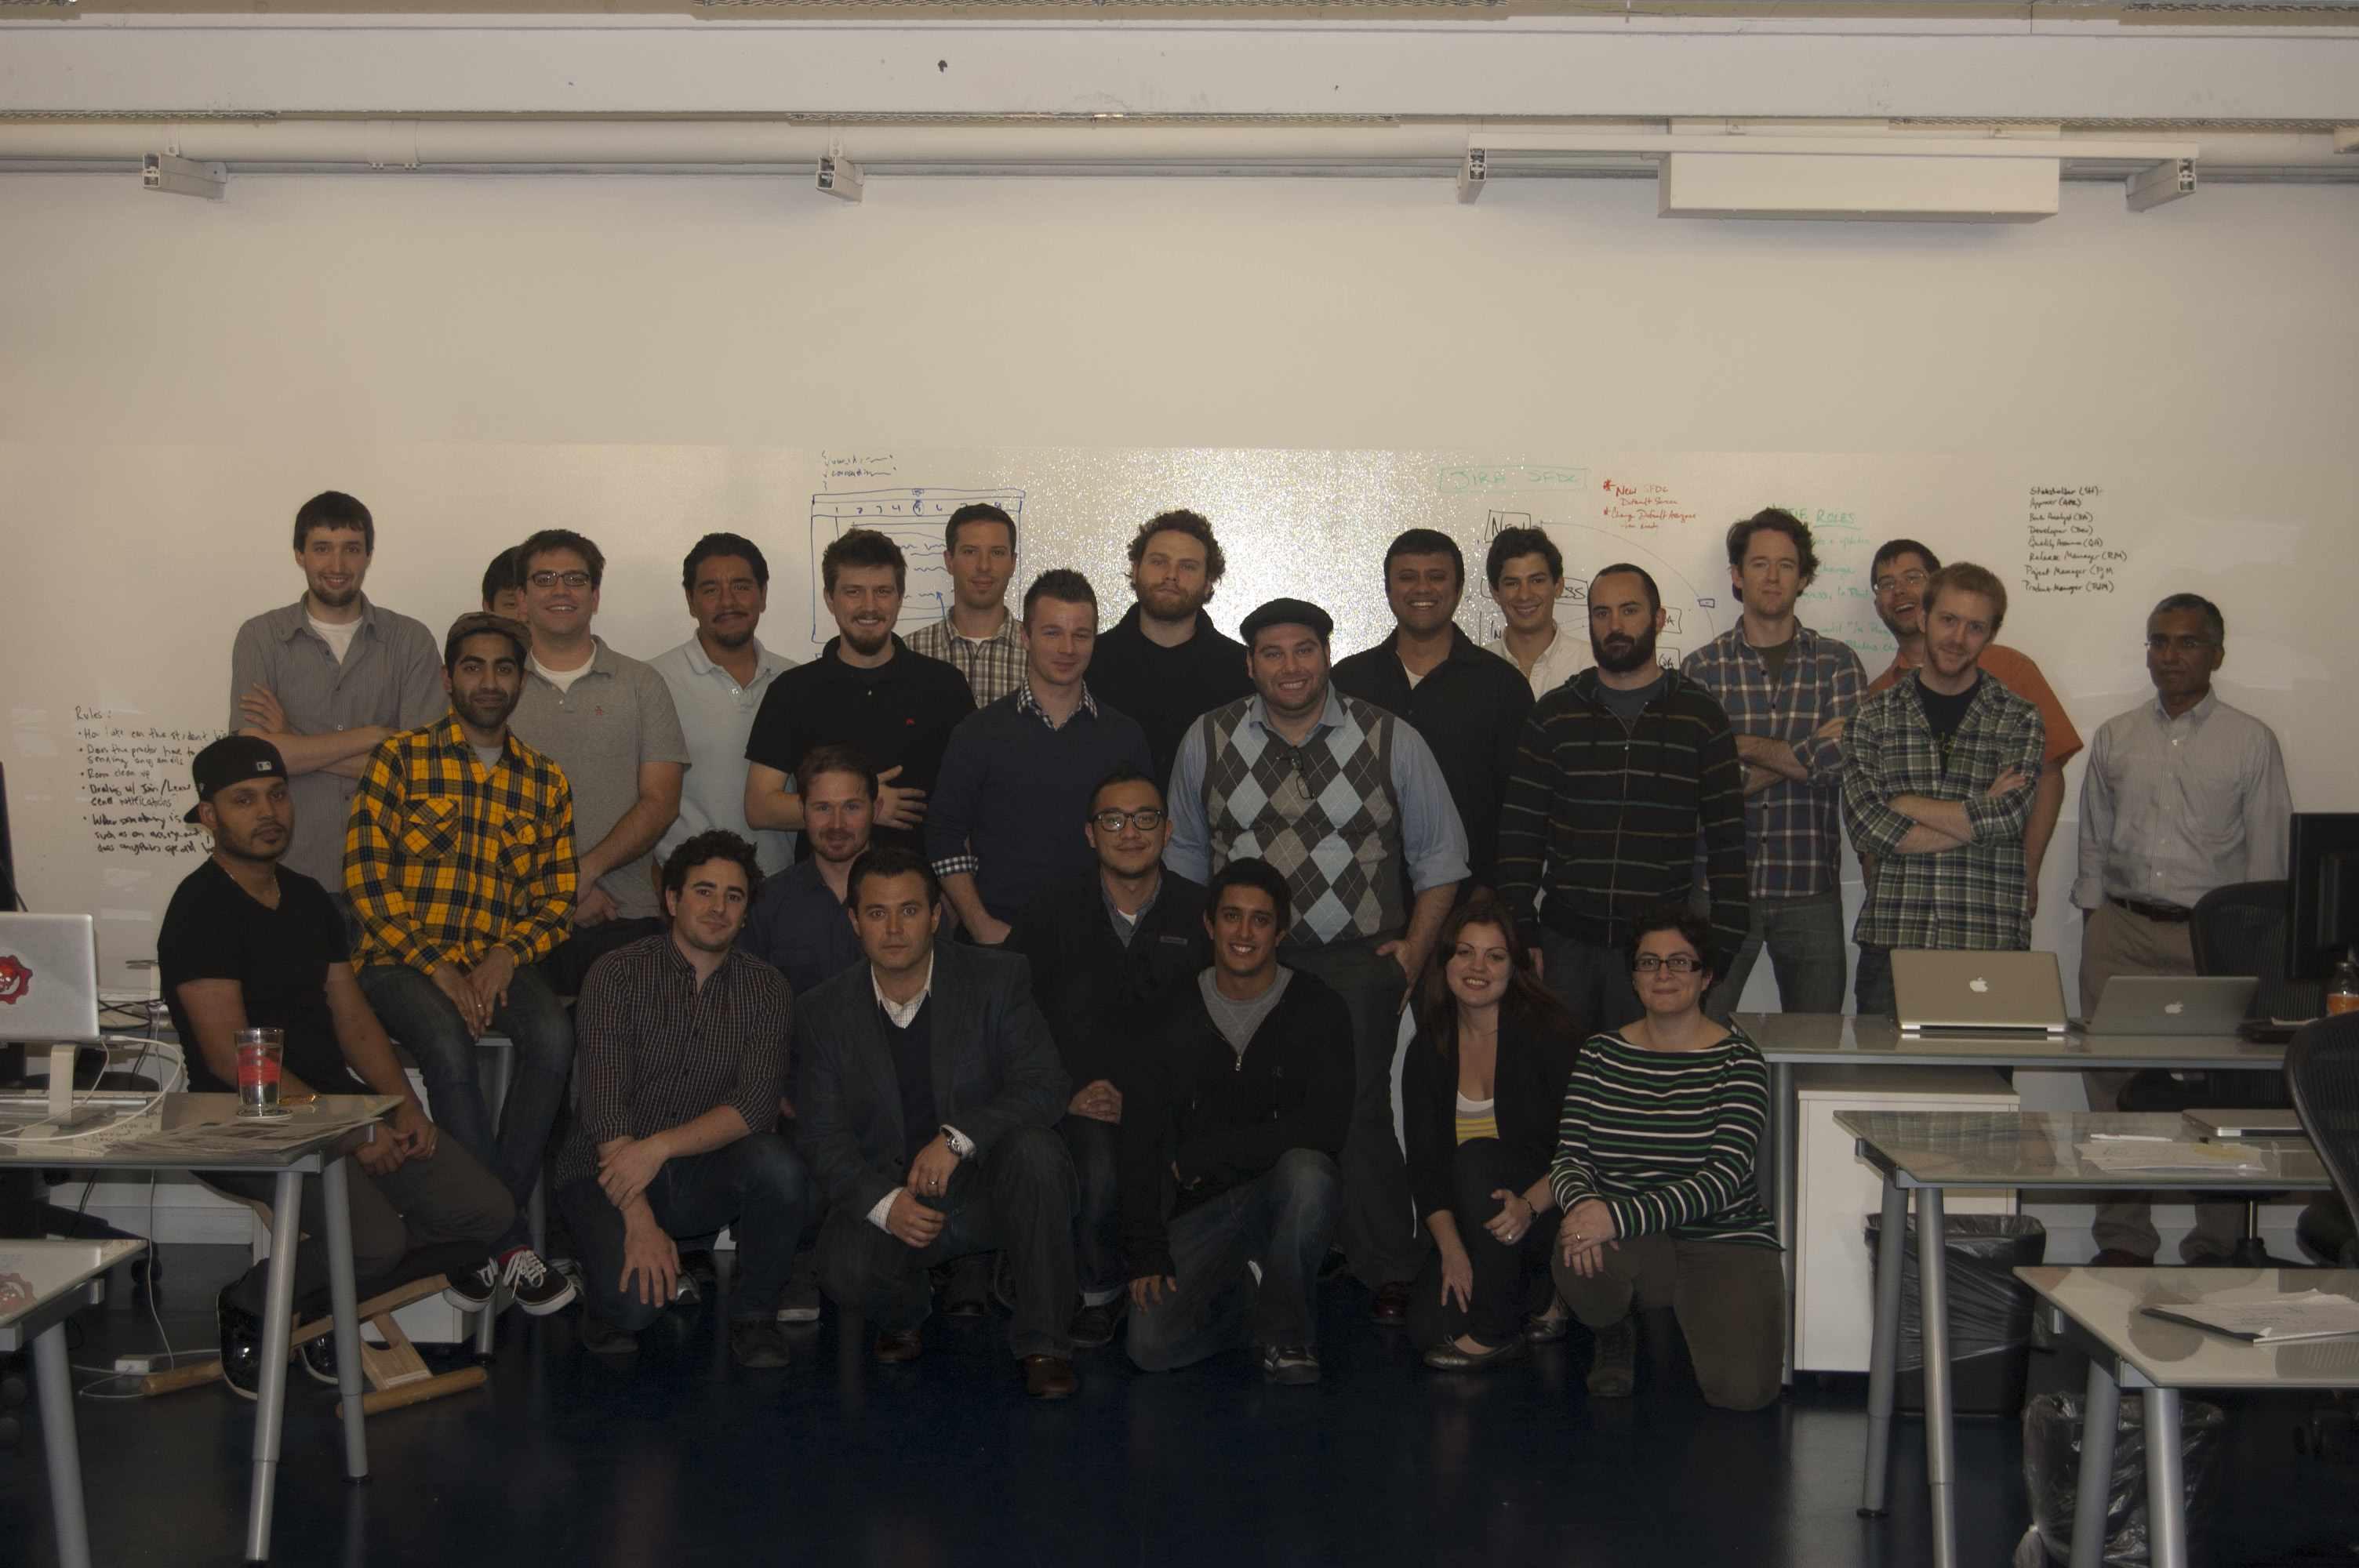 2012-10-24-2Utechteam.jpg